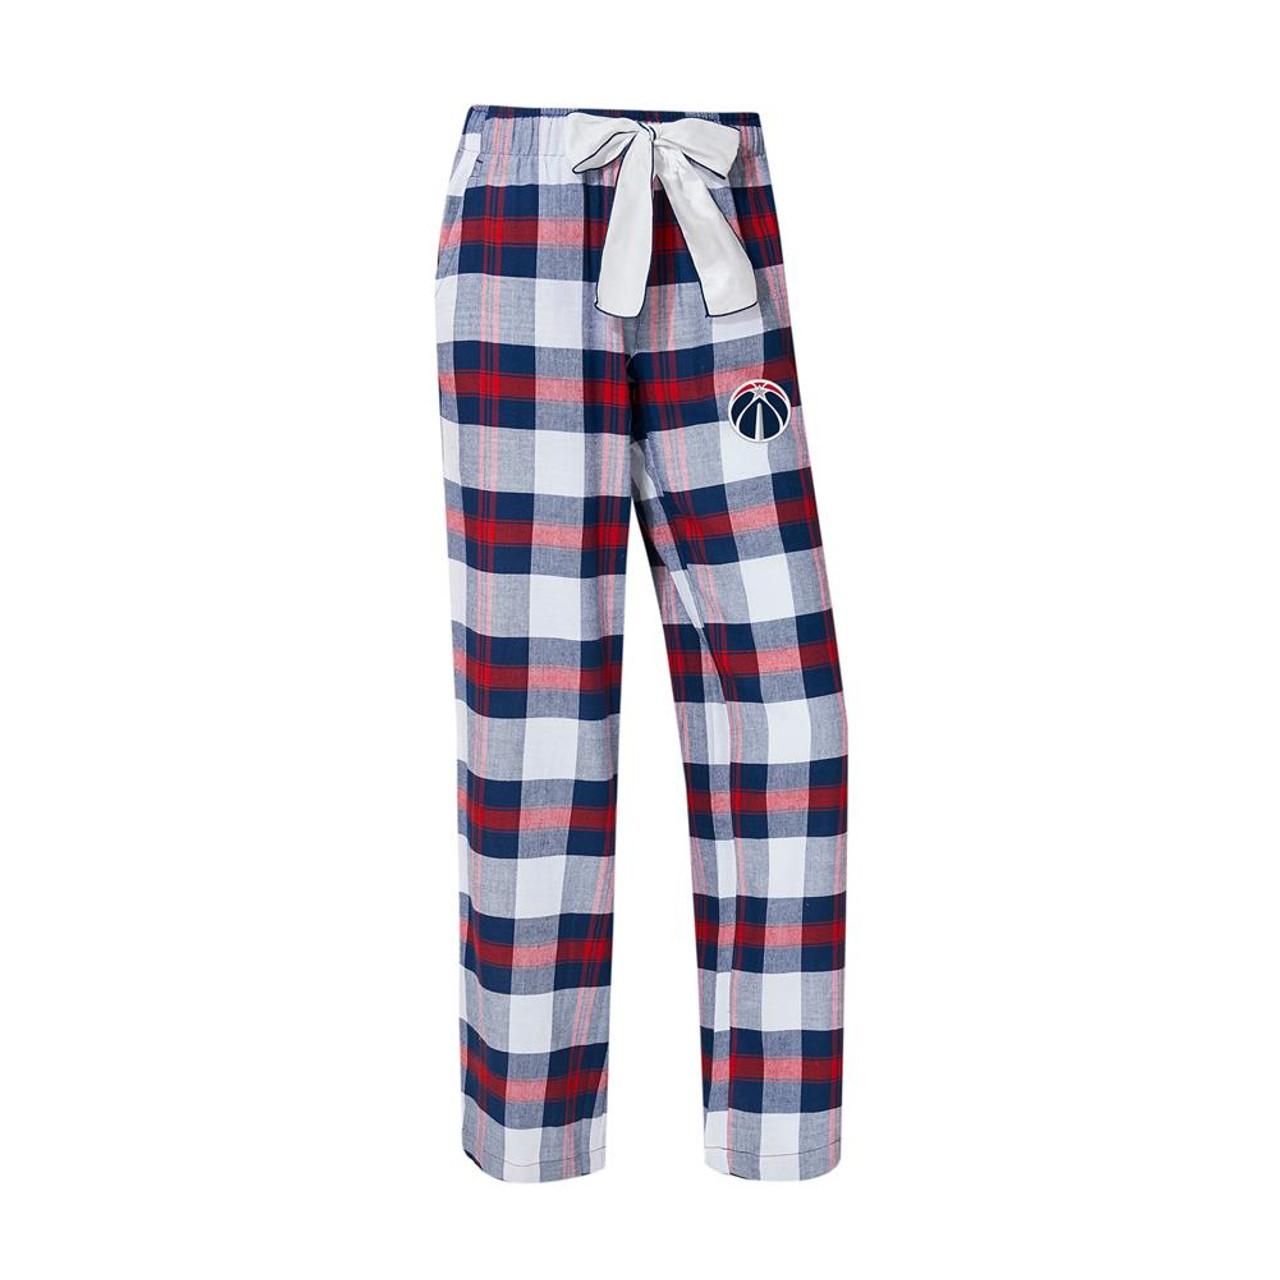 Washington Wizards Women's Flannel Pajamas Plaid PJ Bottoms